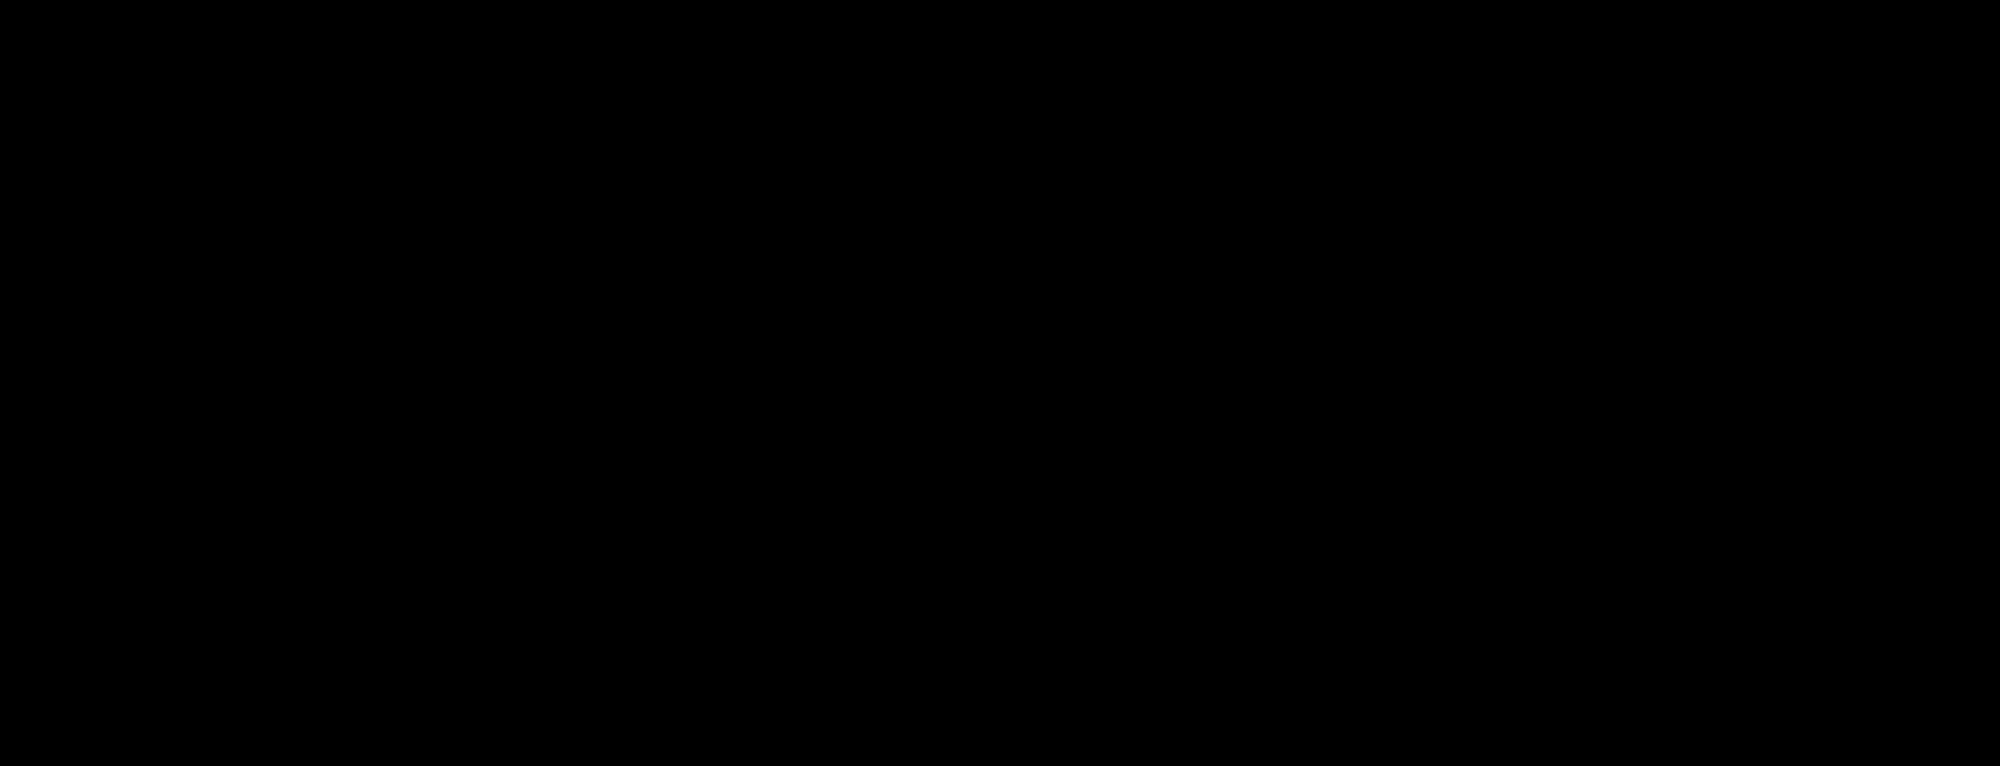 Flying_J_Logo.svg